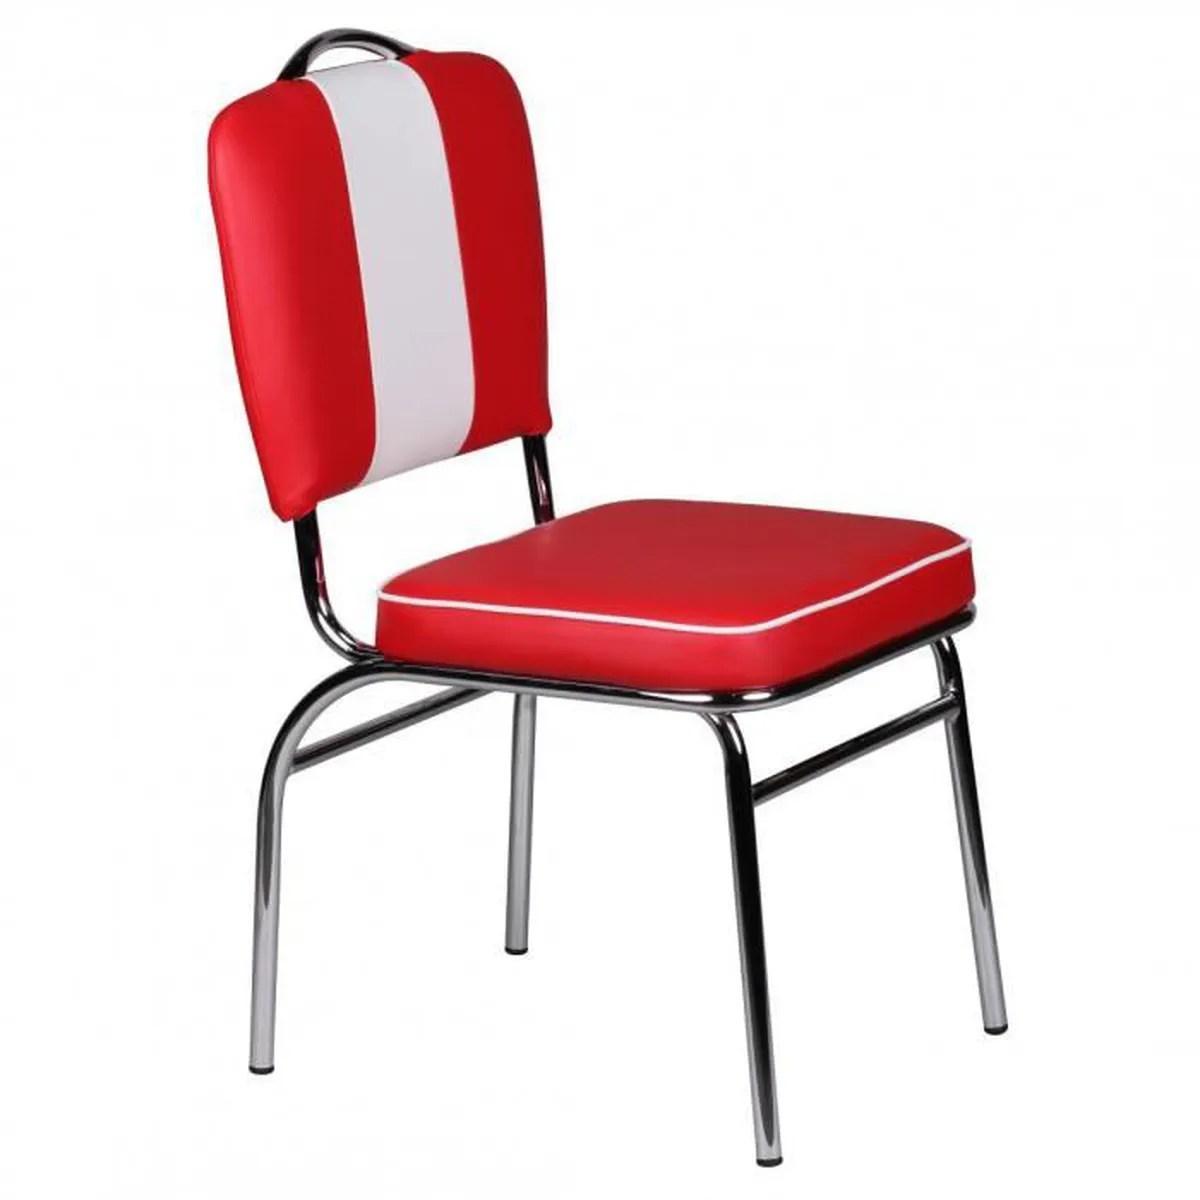 salle chaise americaine 50s diner retro